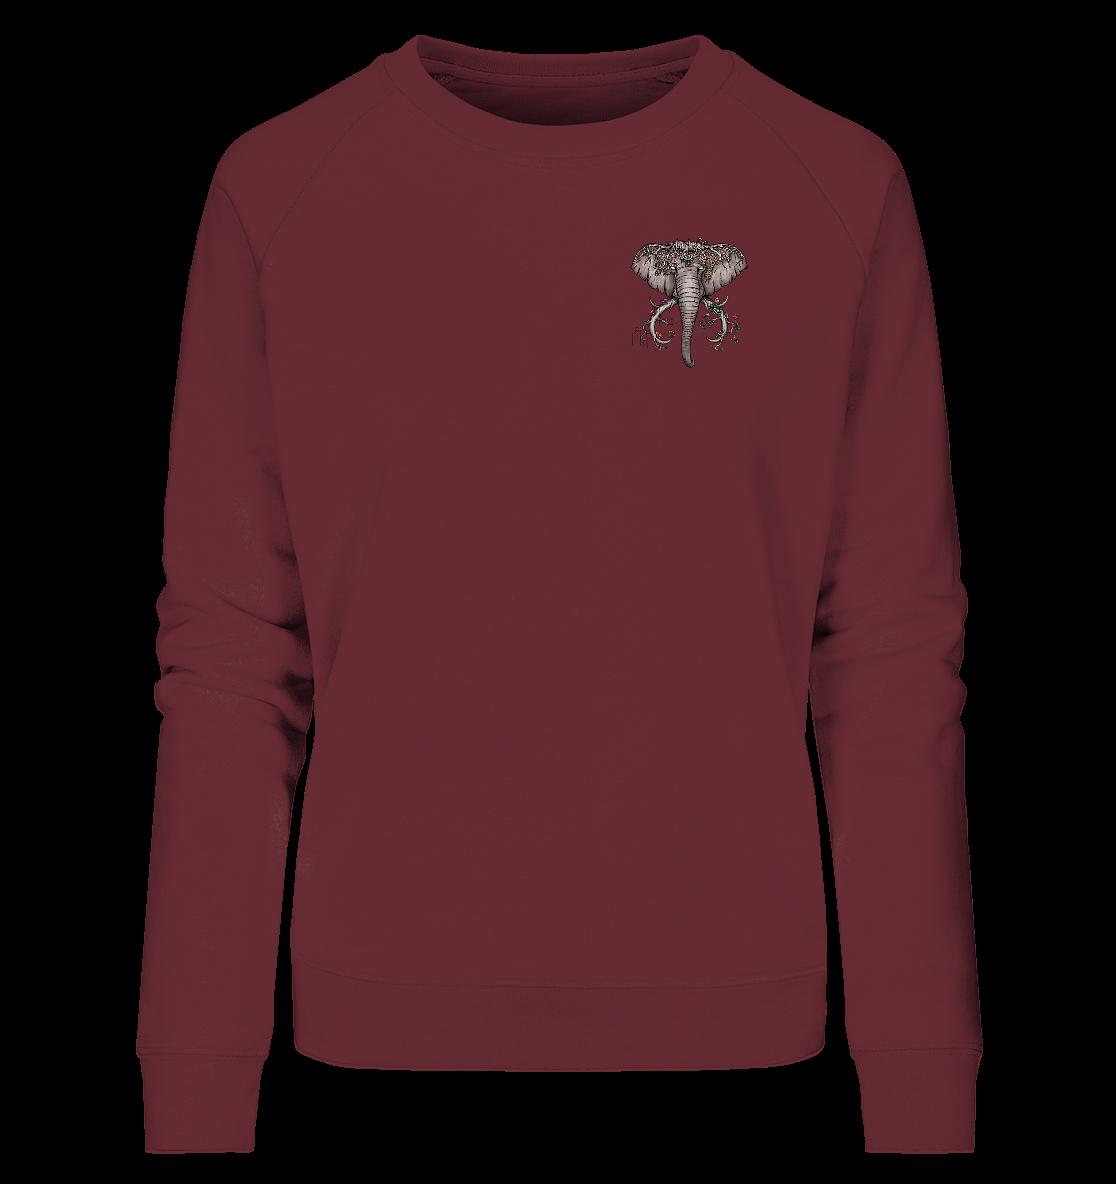 front-ladies-organic-sweatshirt-672b34-1116x-2.png